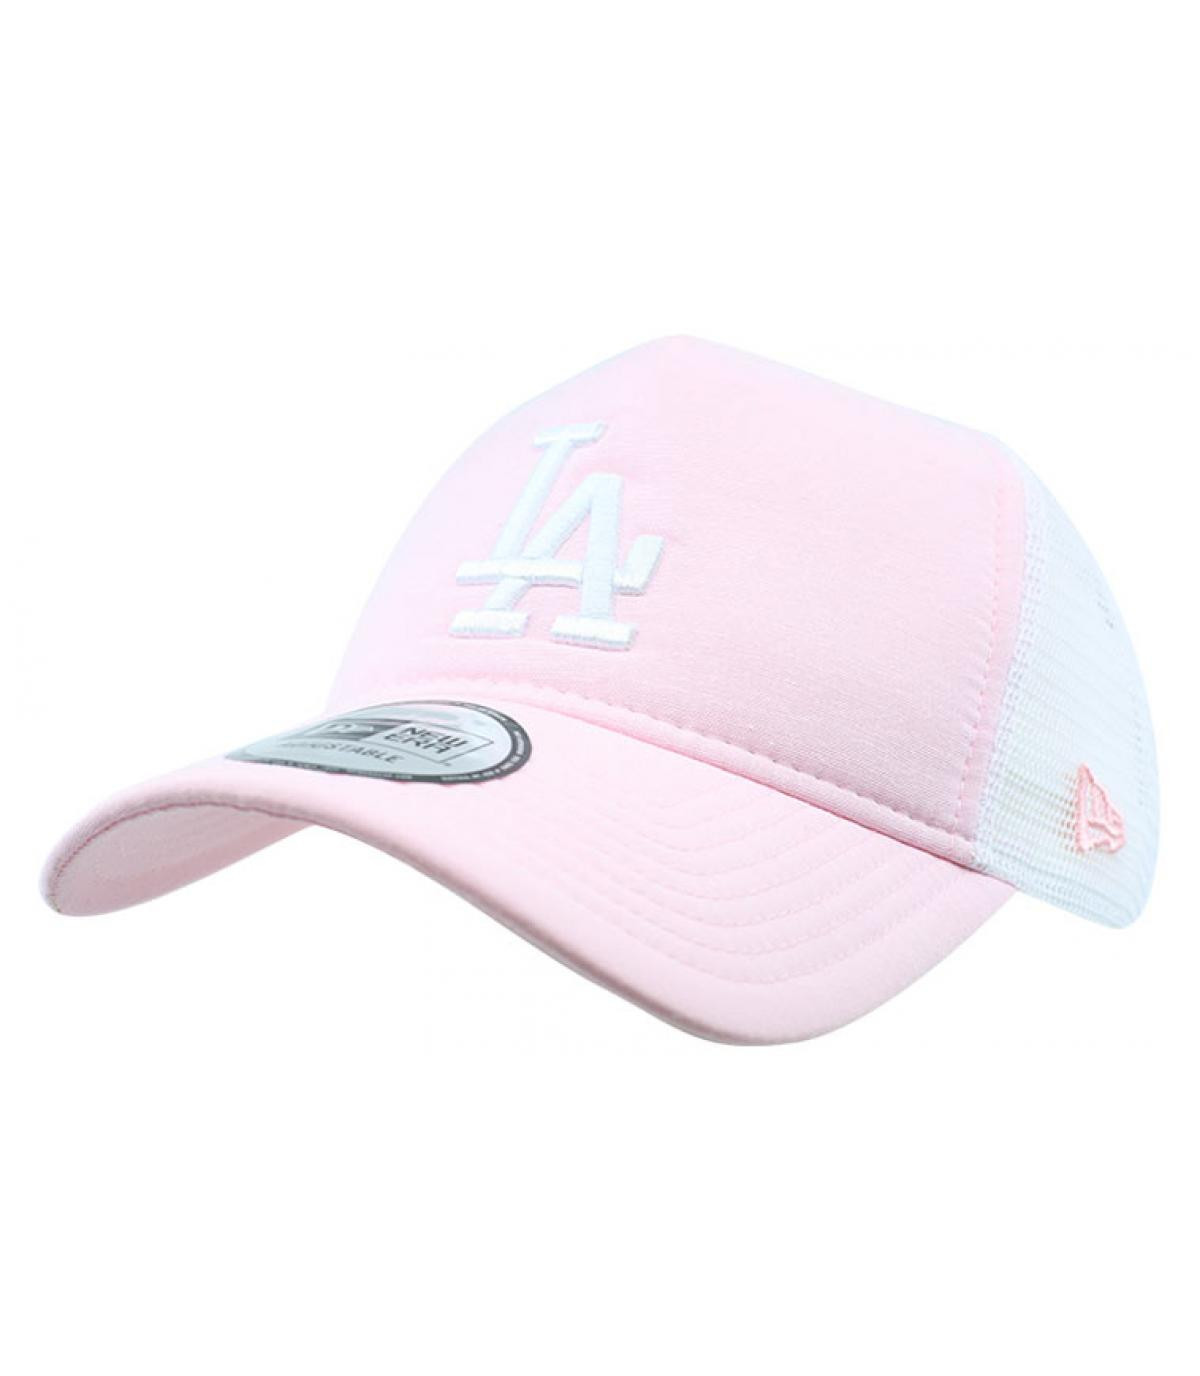 Detalles MLB Oxford LA pink imagen 2